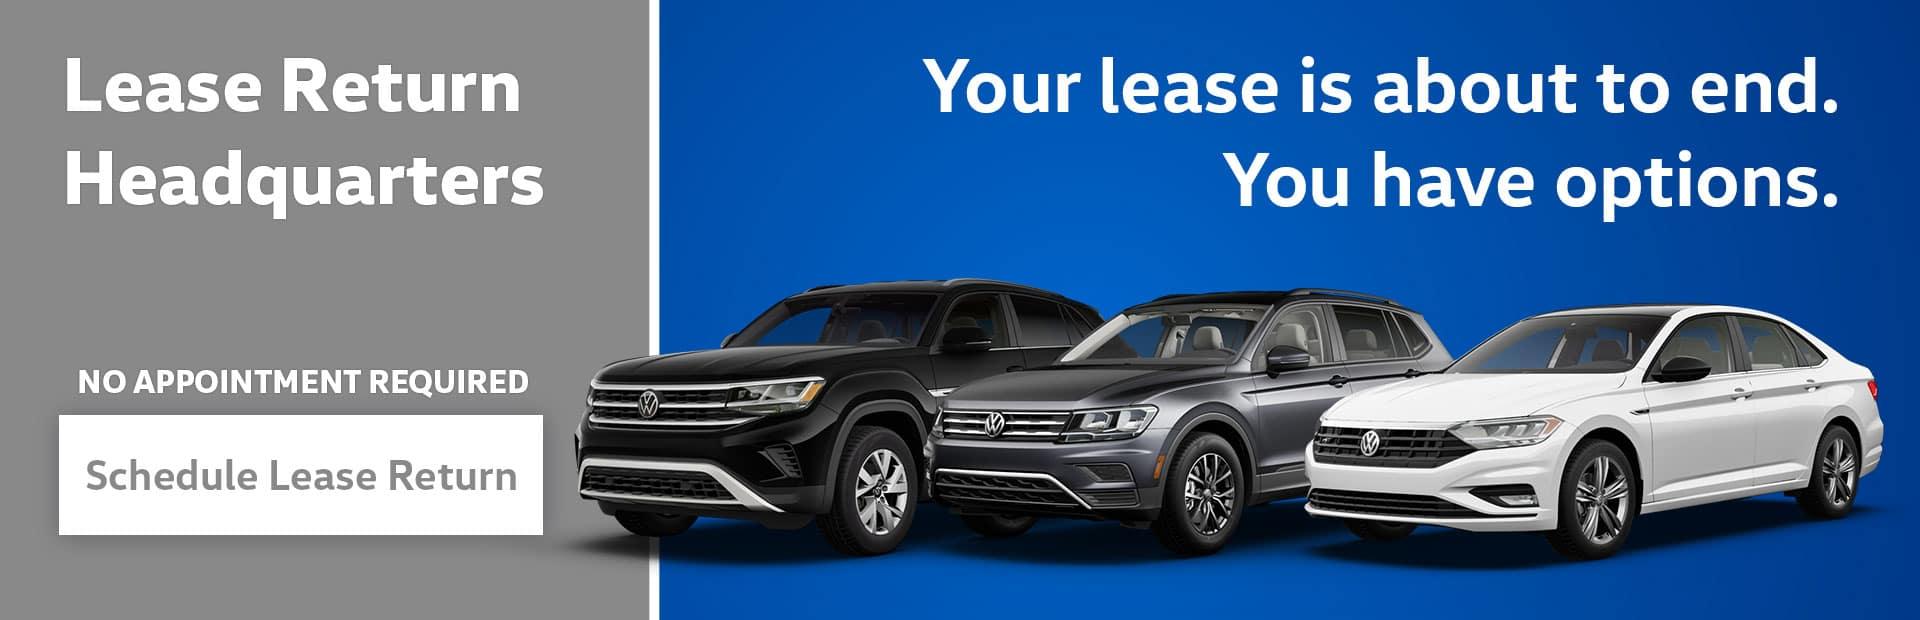 lease return service center